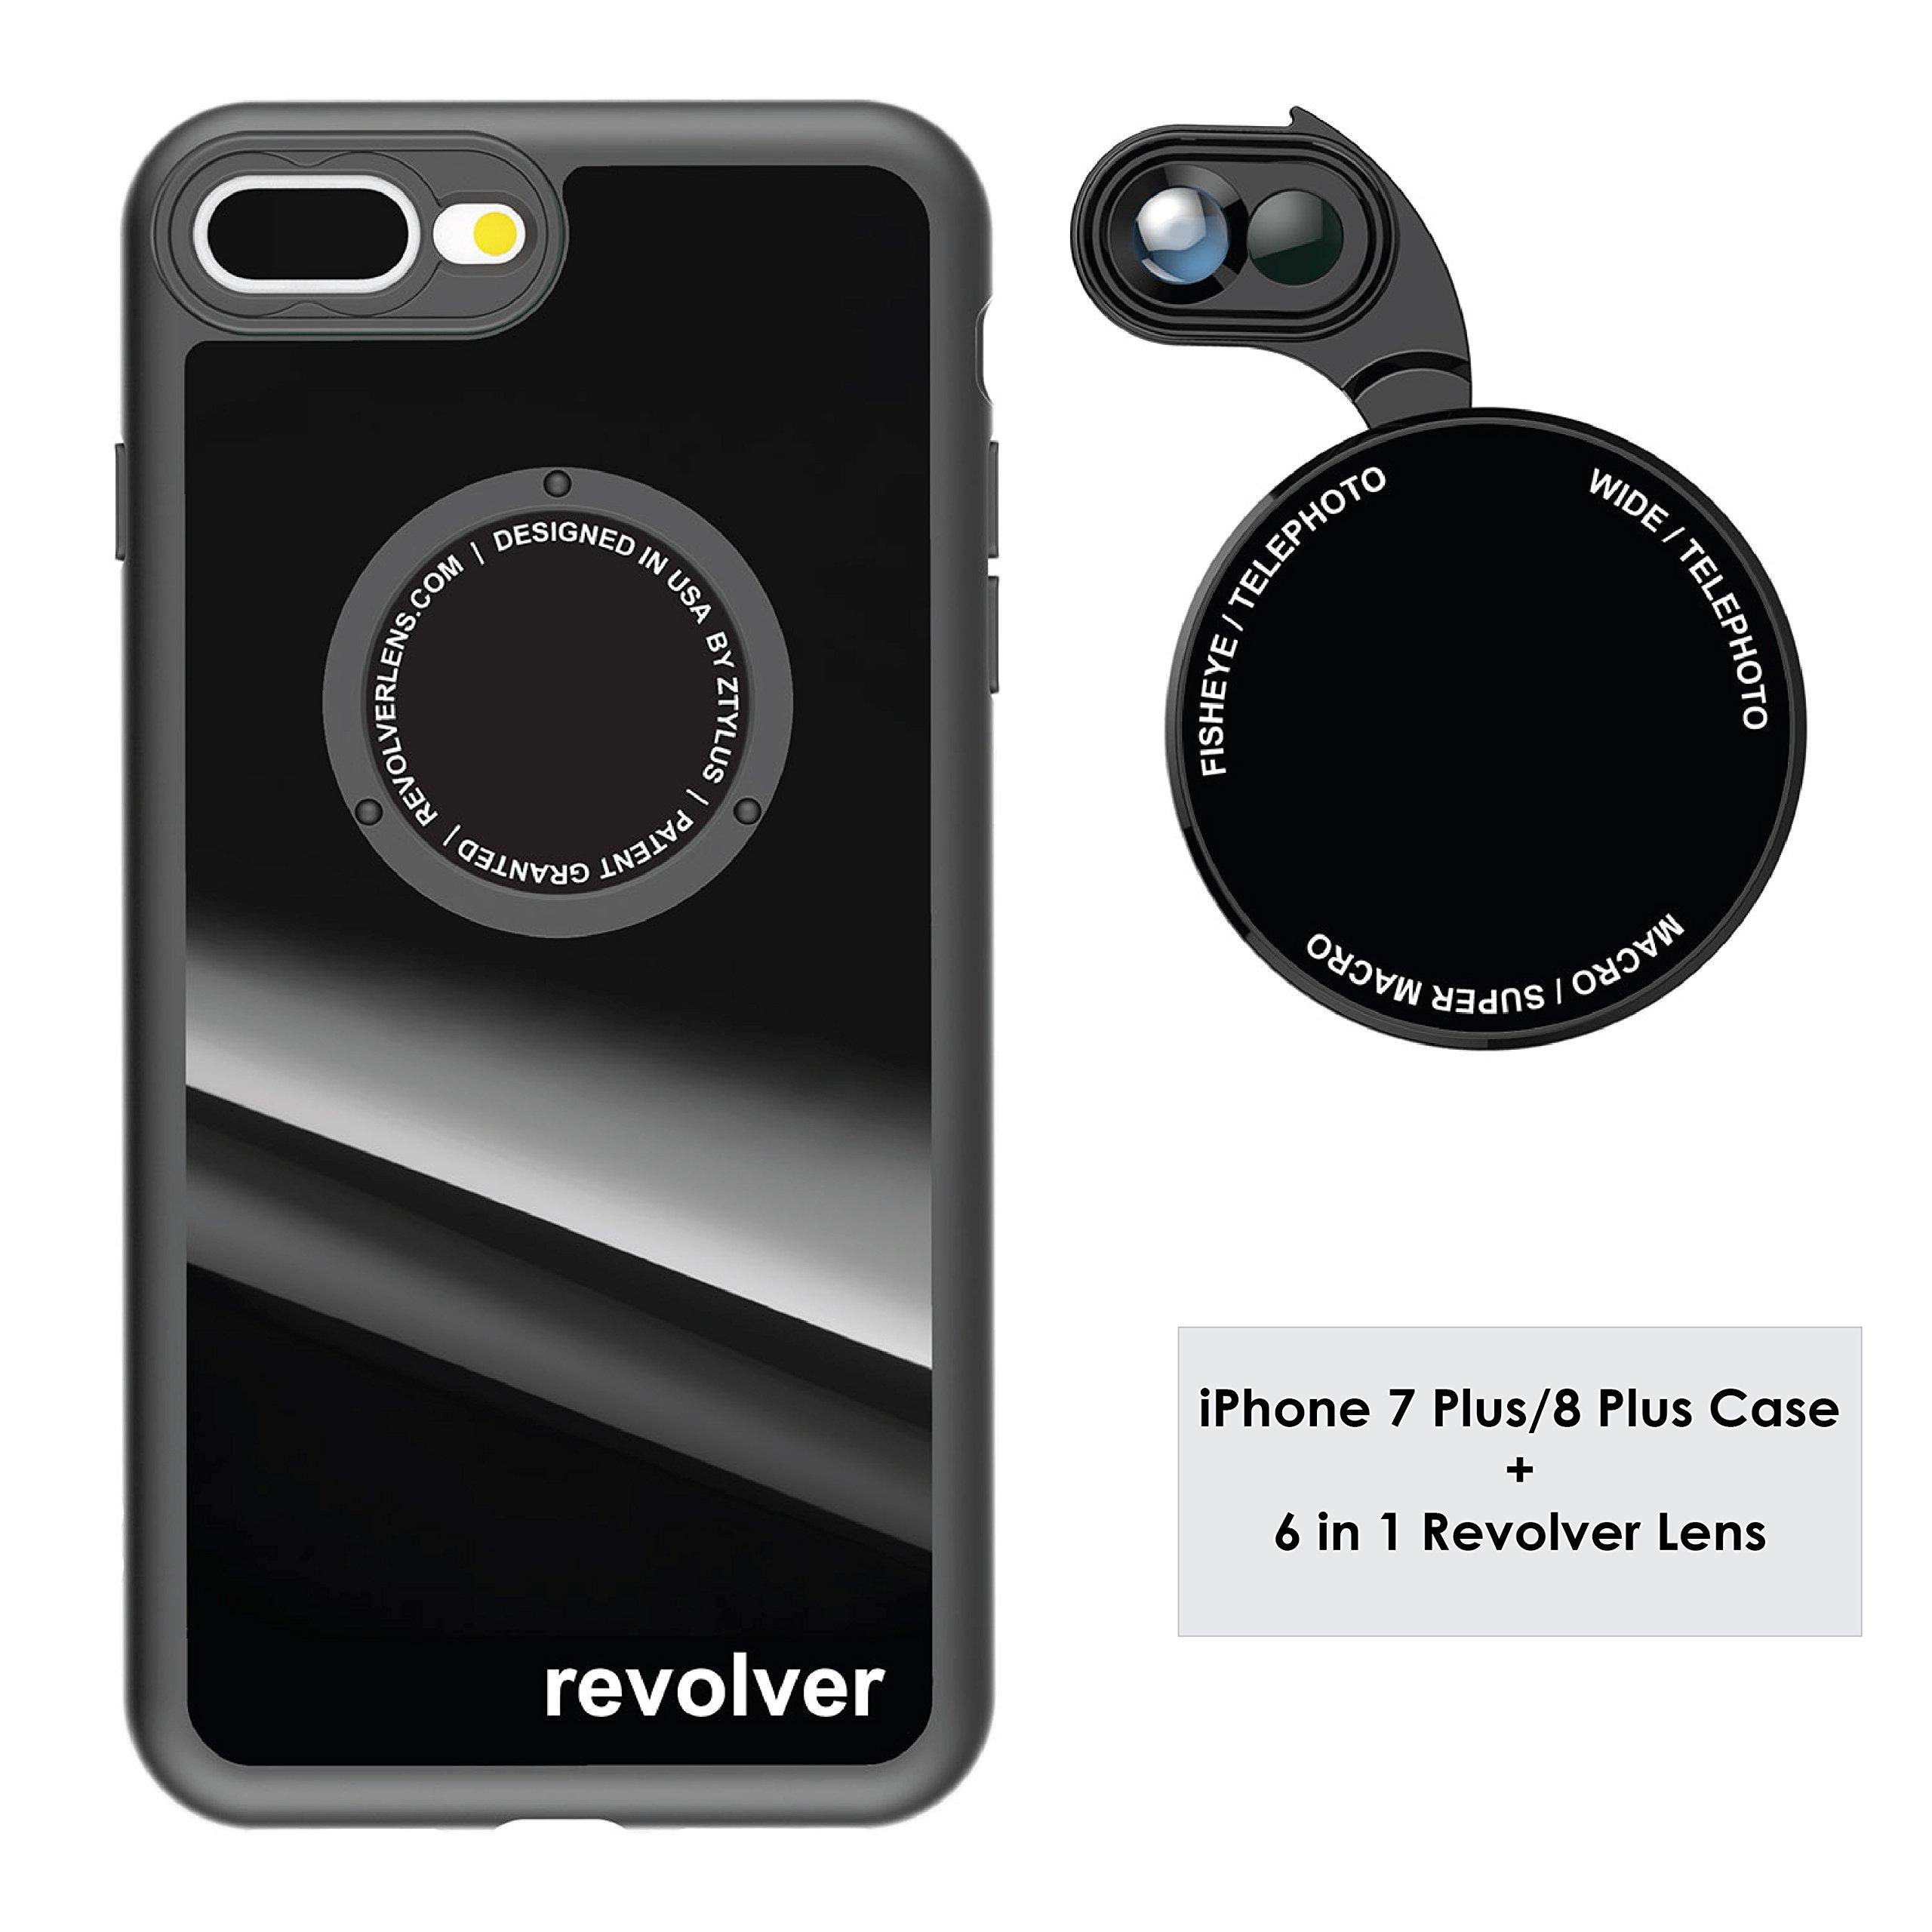 Ztylus Gloss Black Revolver M Series Camera Kit: 6 in 1 Lens with Case for iPhone 7 Plus / 8 Plus - 2X Telephoto Lens, Macro, Super Macro Lens, Wide Angle Lens (Gloss Black) by Ztylus